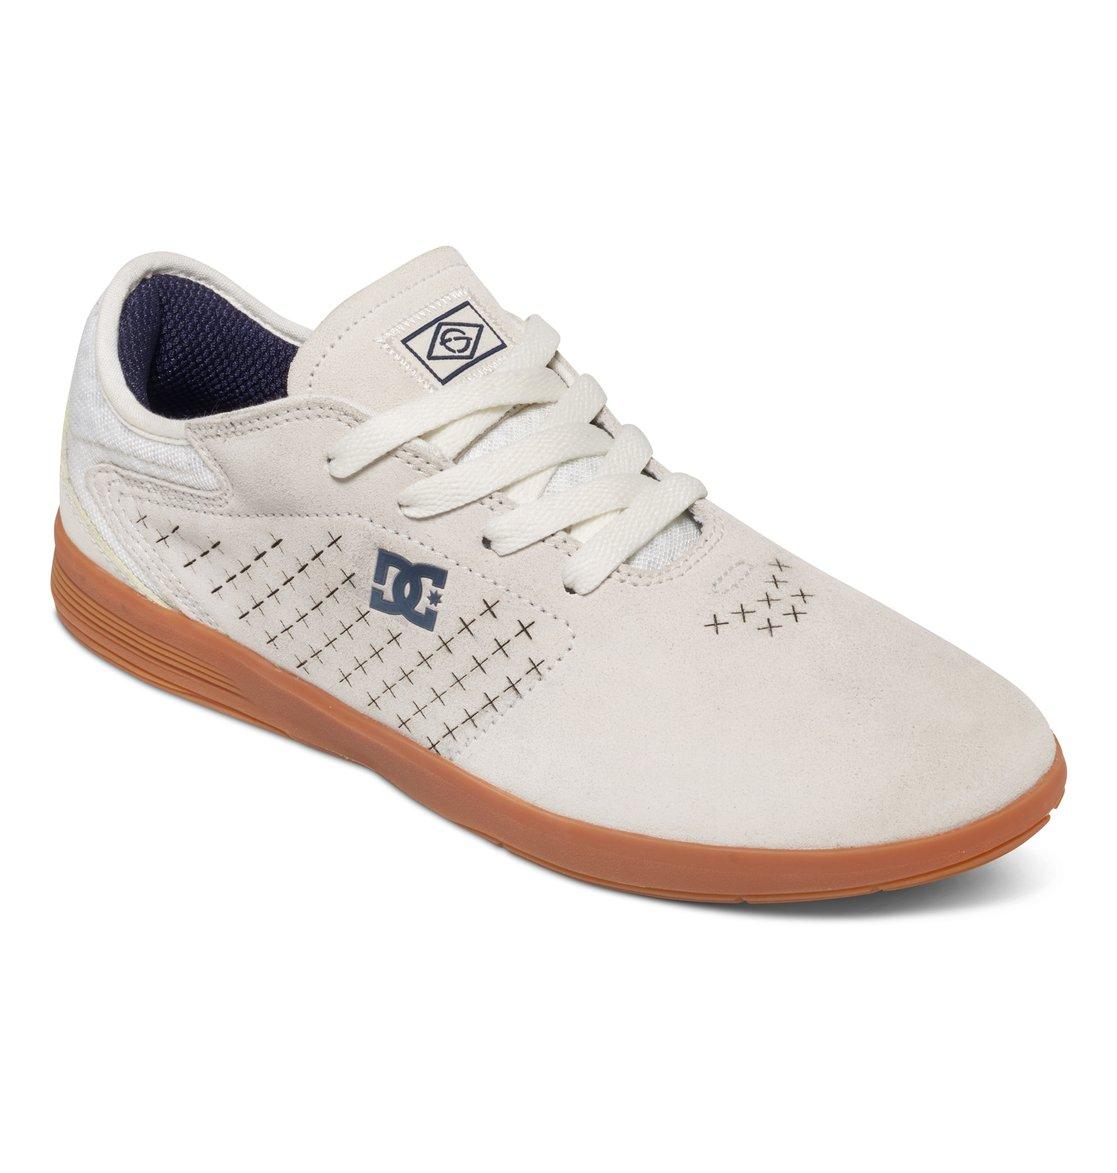 Skate shoes dc - 1 Men S New Jack S Felipe Skate Shoes White Adys100369 Dc Shoes